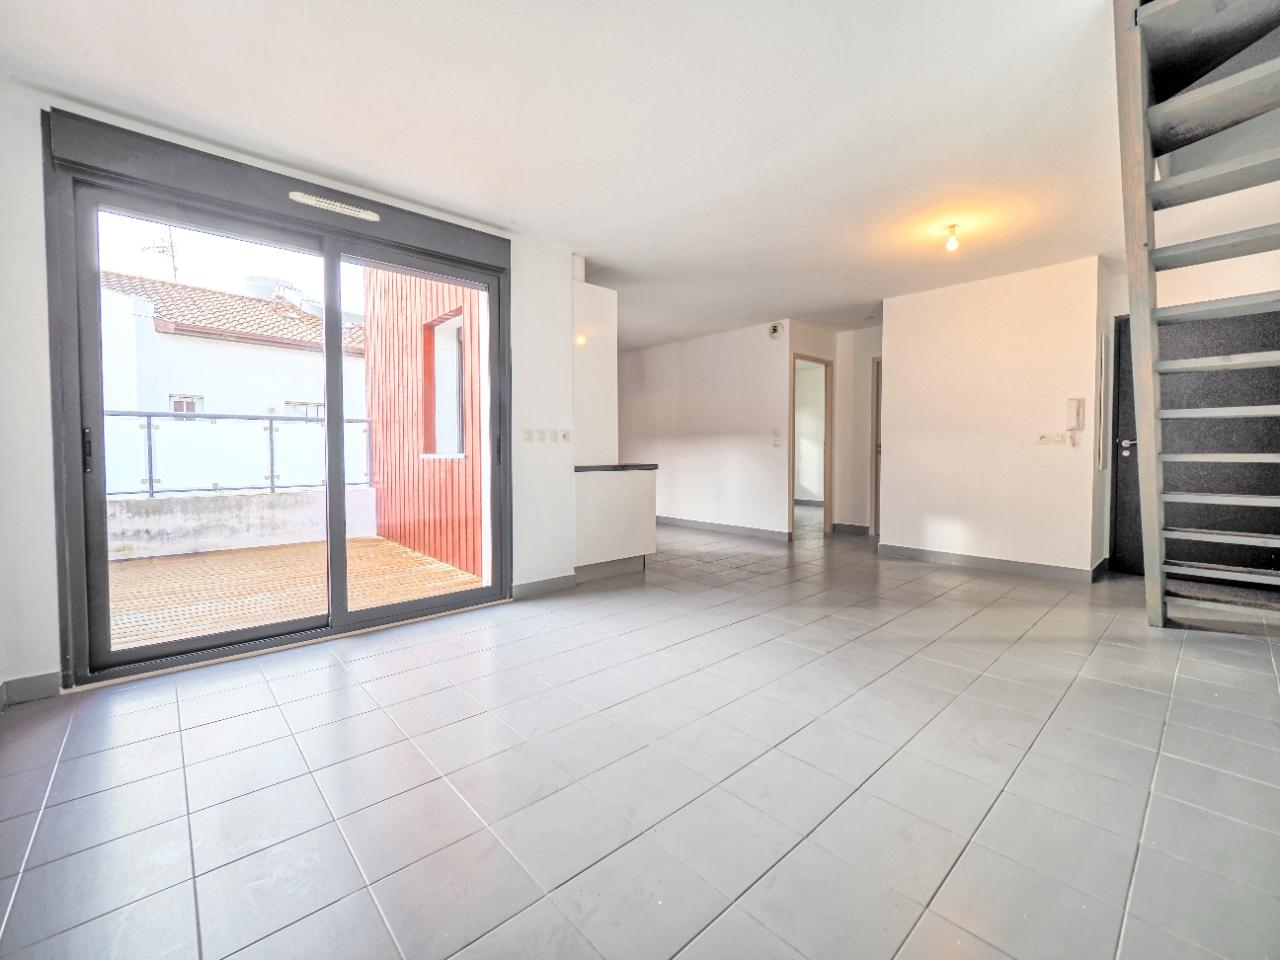 vente appartement à CIBOURE - 381 600